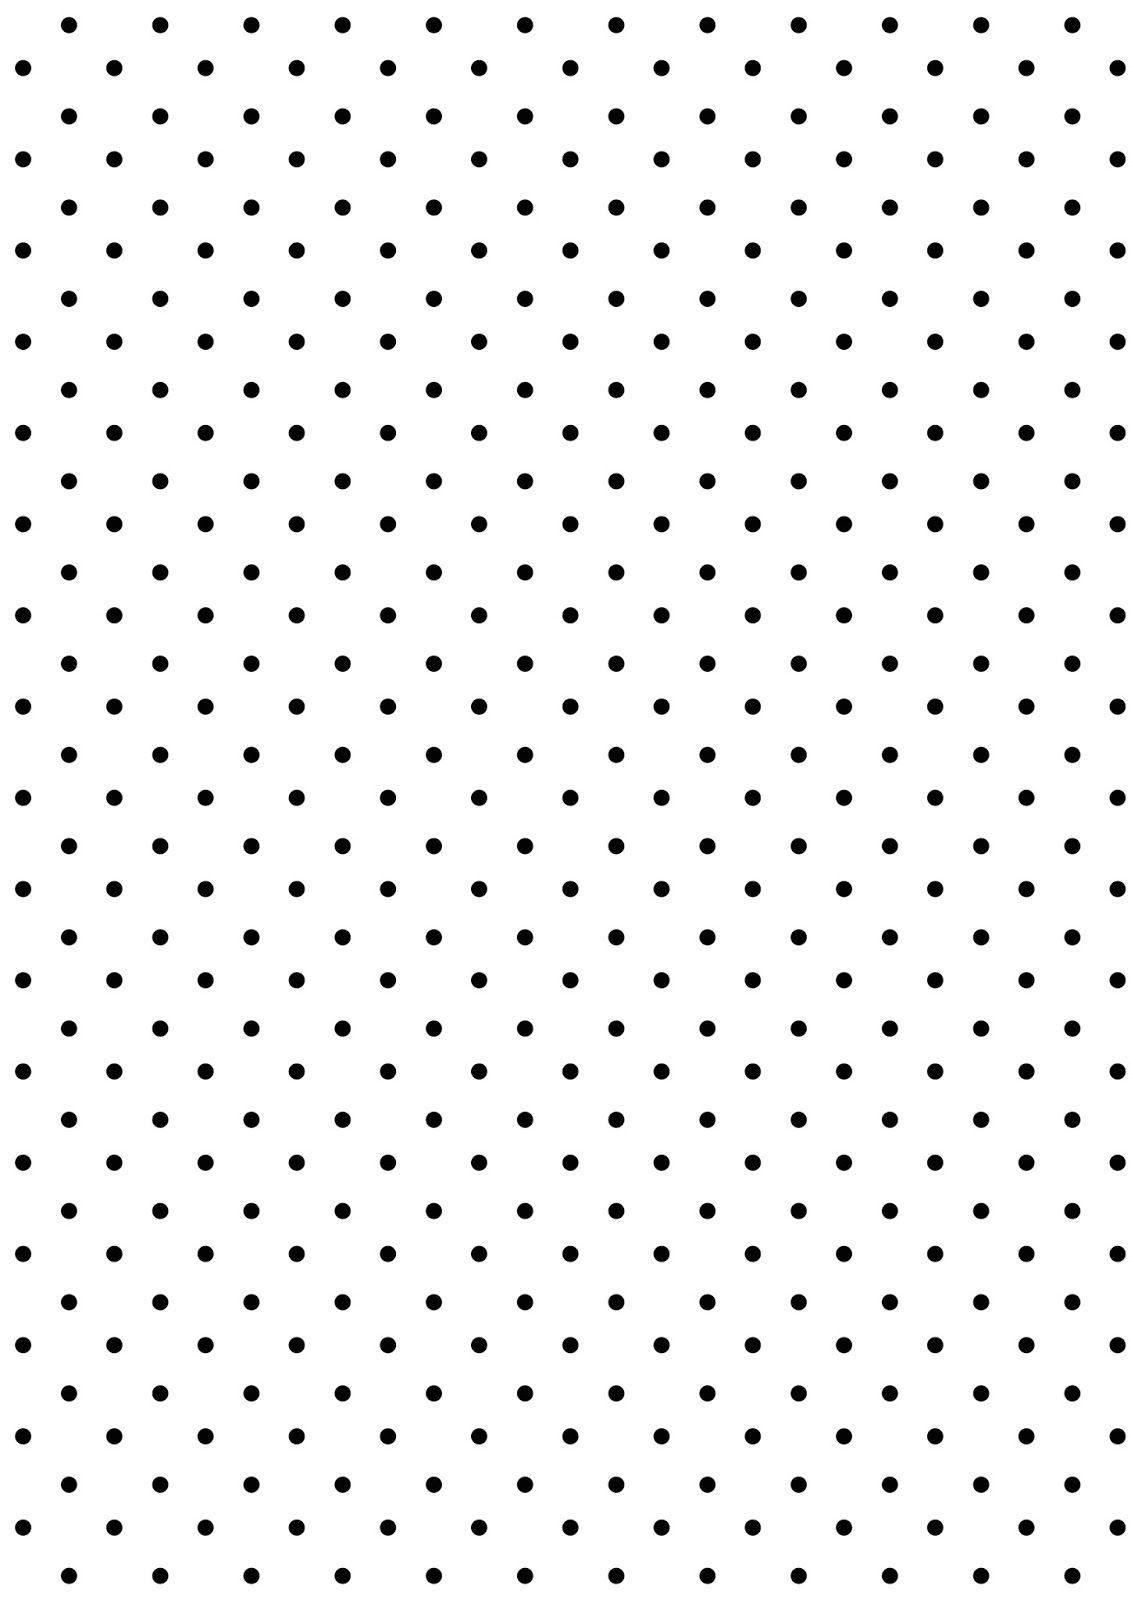 Free digital polka dot scrapbooking paper - ausdruckbares ...